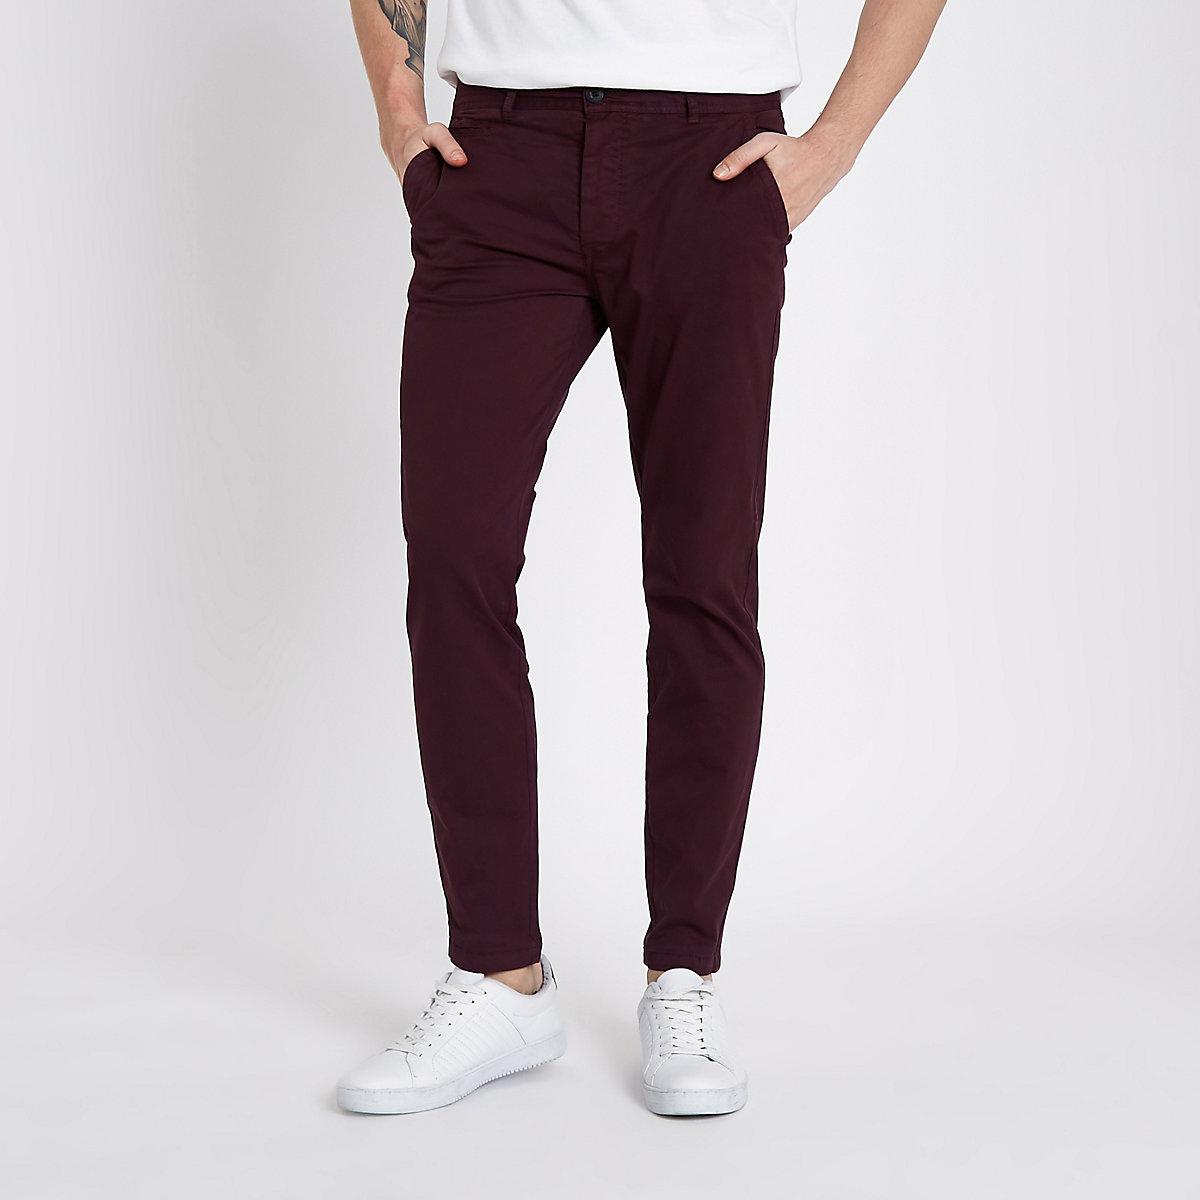 Burgundy super skinny stretch chino pants